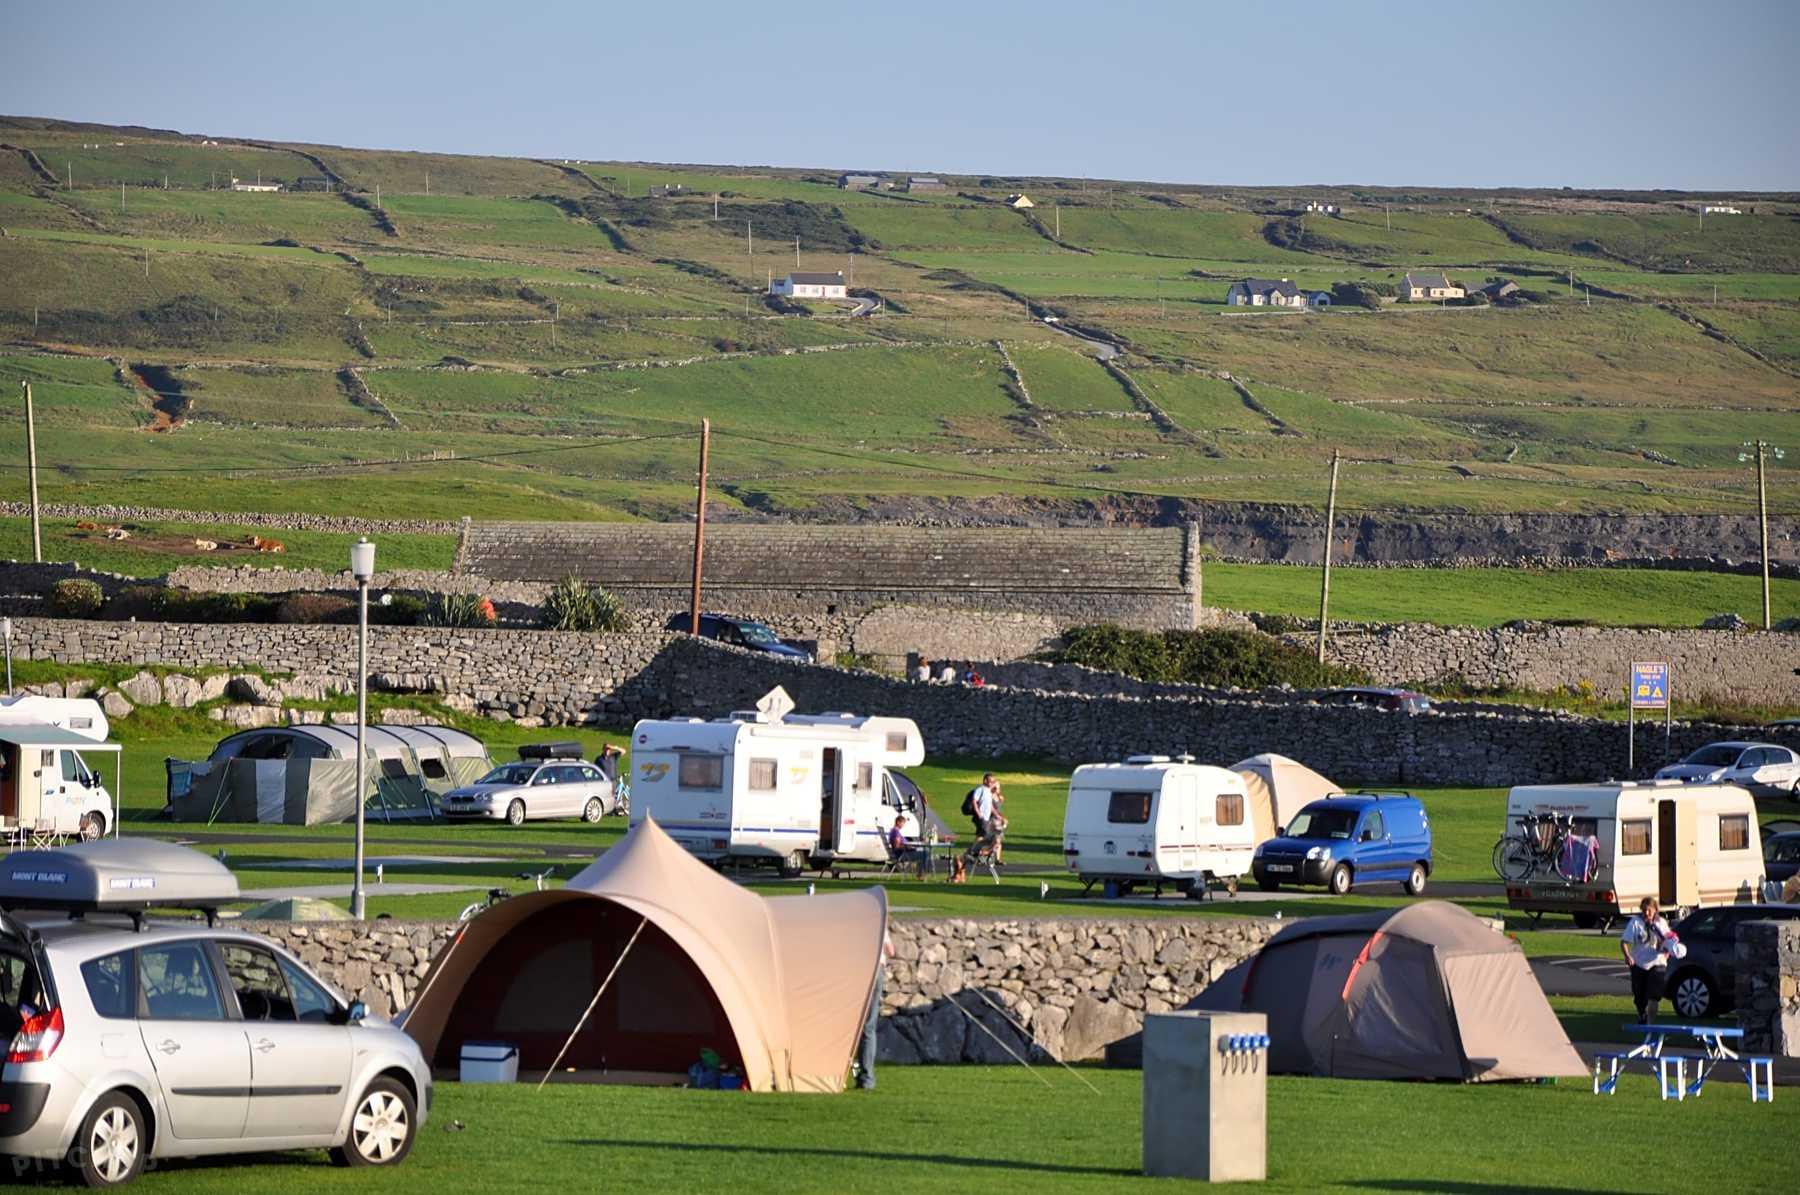 OHallorans Caravan and Camping Park - TripAdvisor